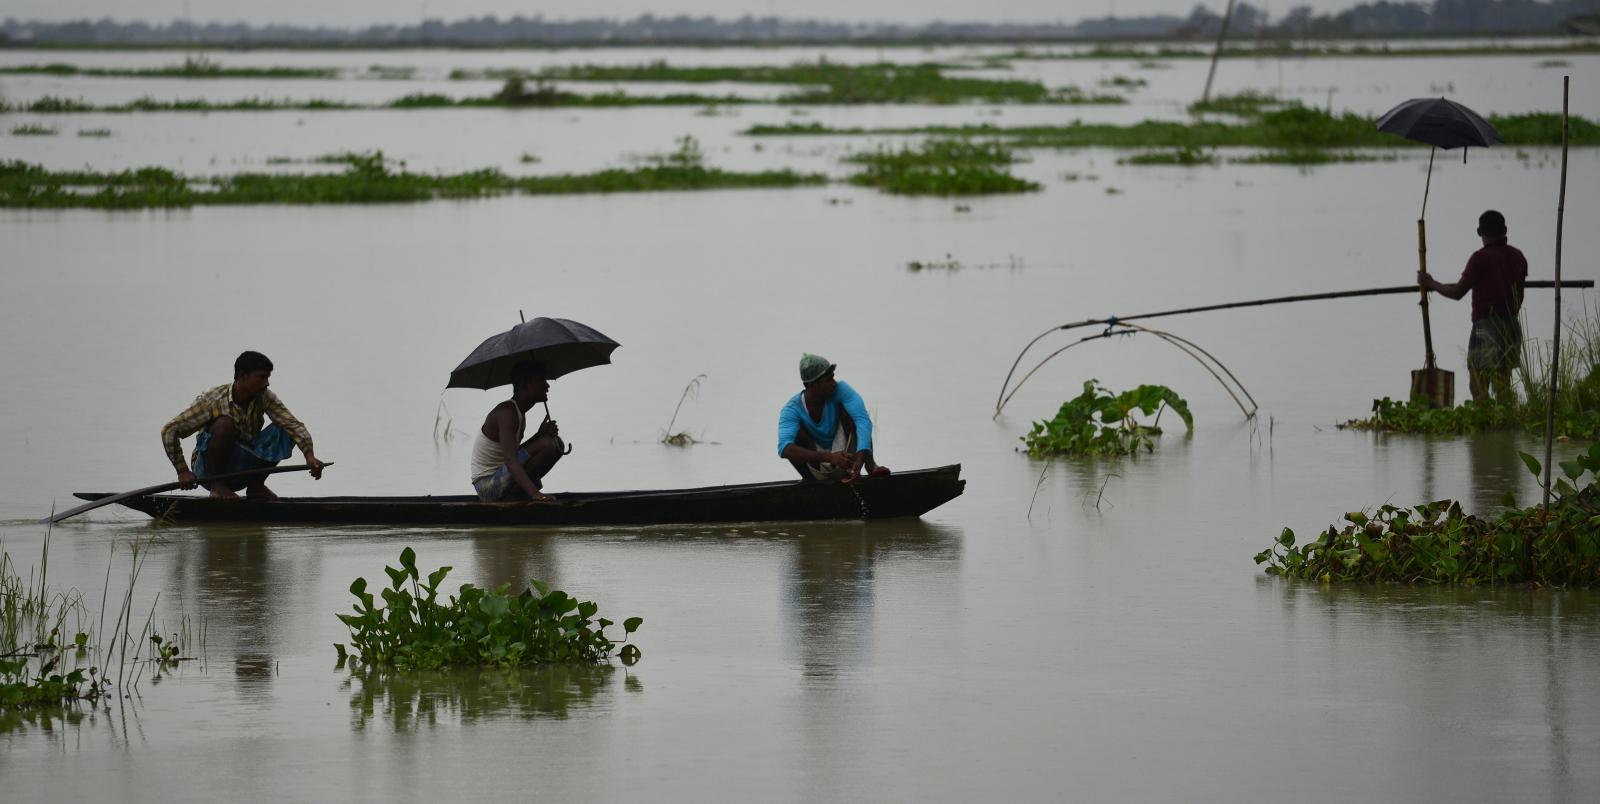 Deszczowa pogoda w Assam Fot. EPA/STR